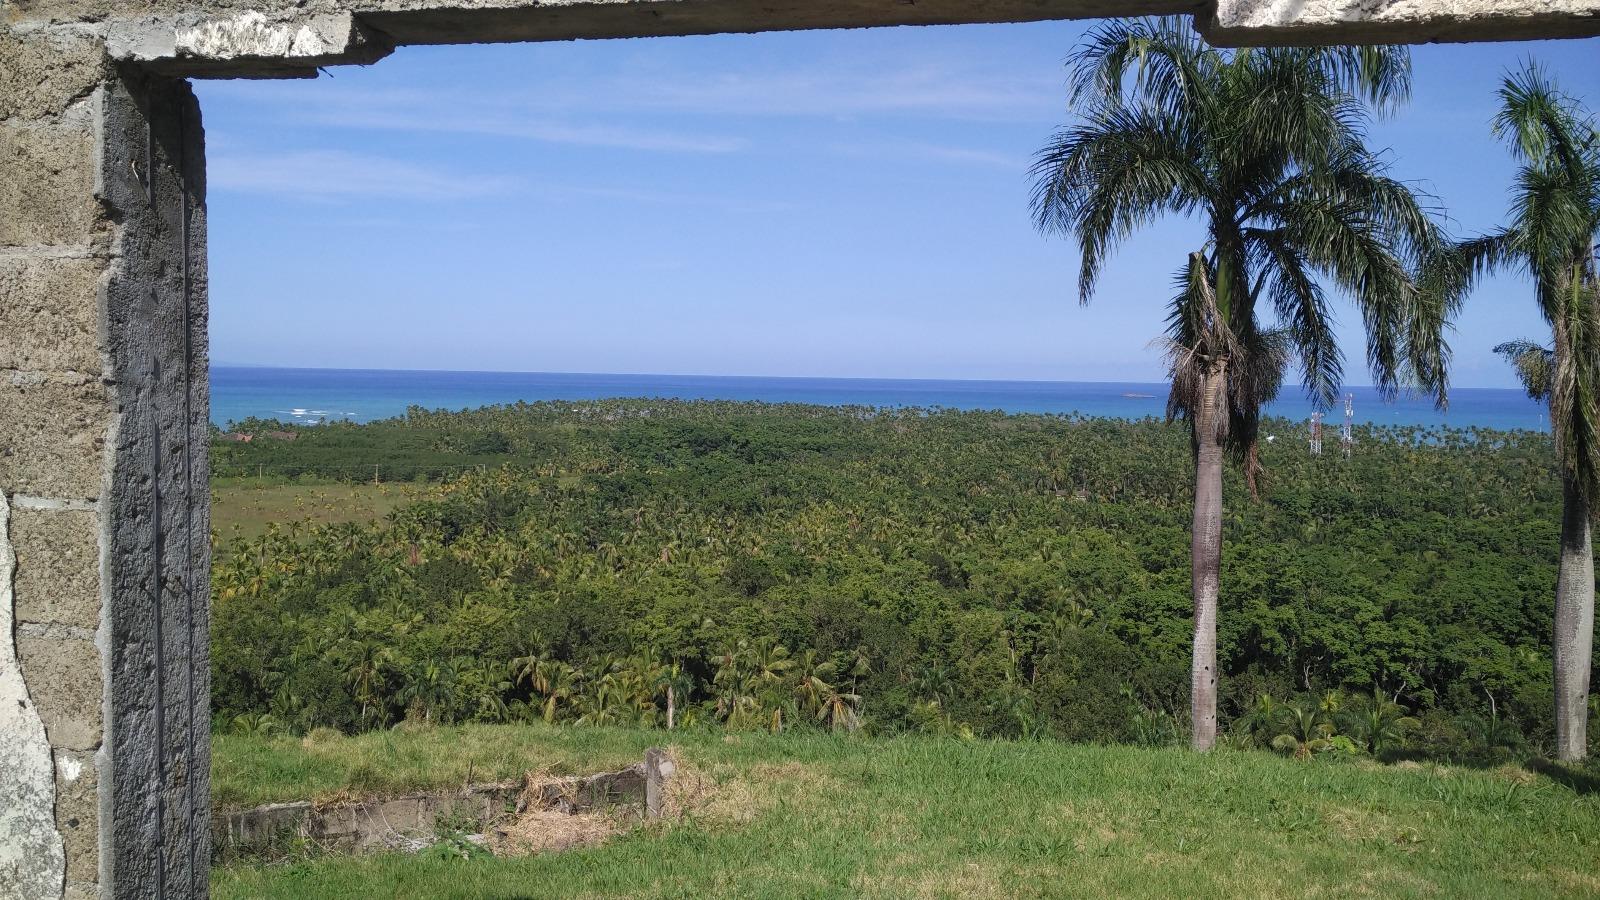 Hill for sale in Las Terrenas Dominican republic 2.jpeg